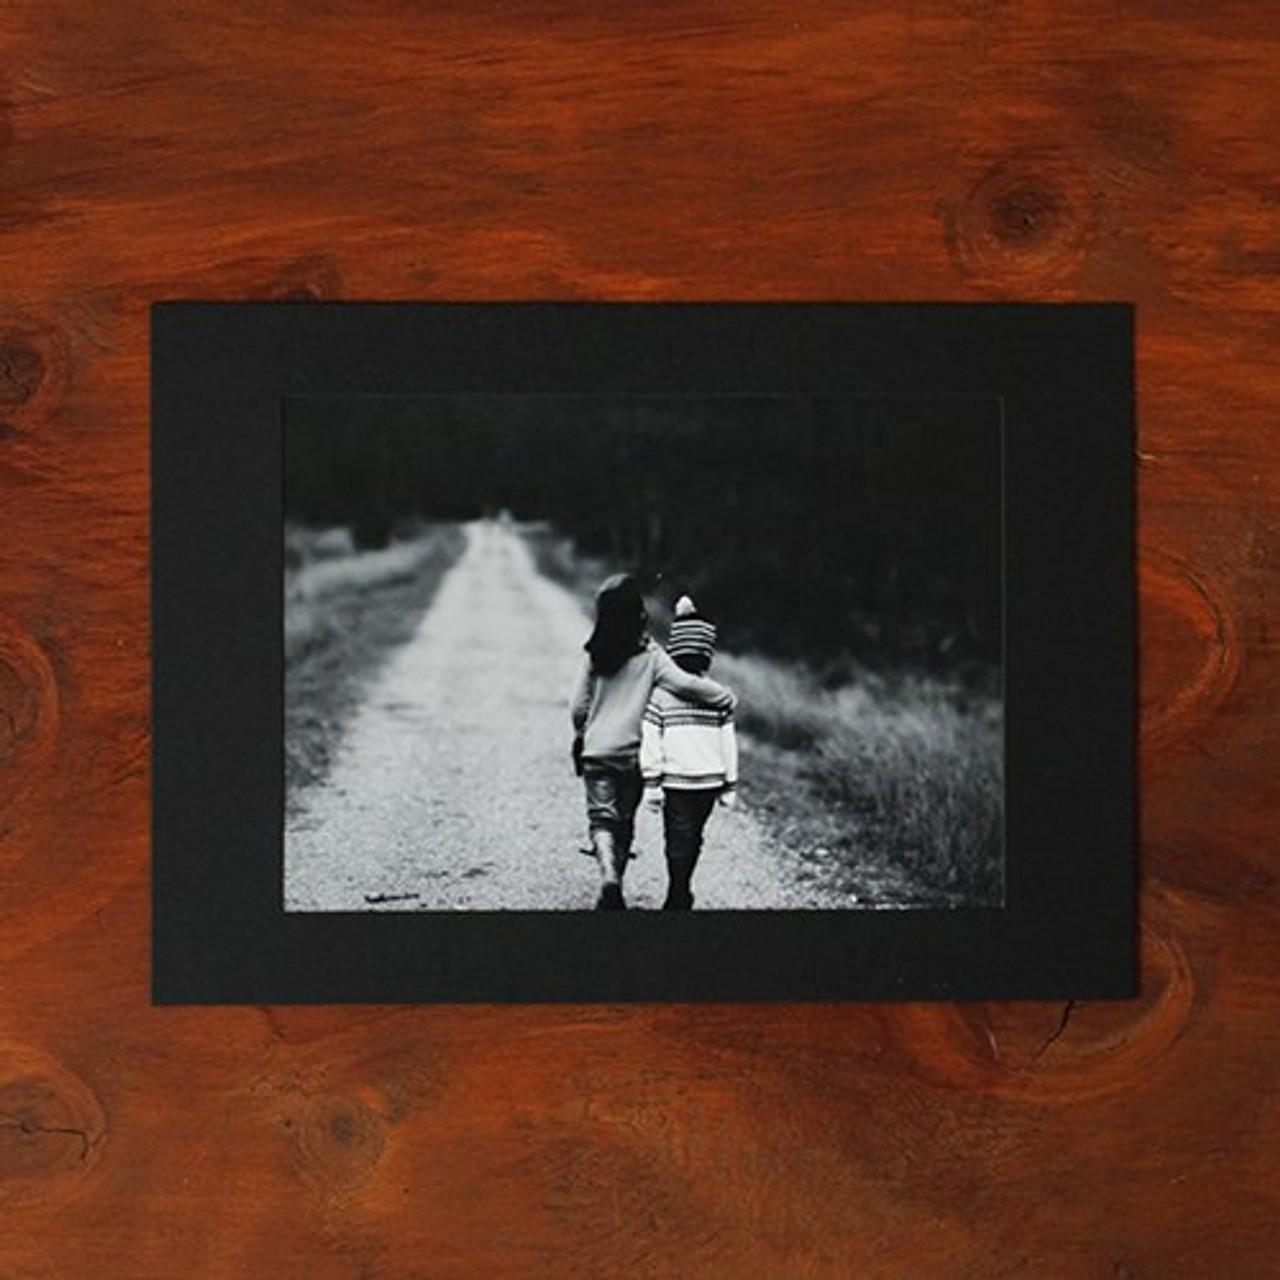 Moods&Views Square 5X7 black paper photo frame set of 15 sheets